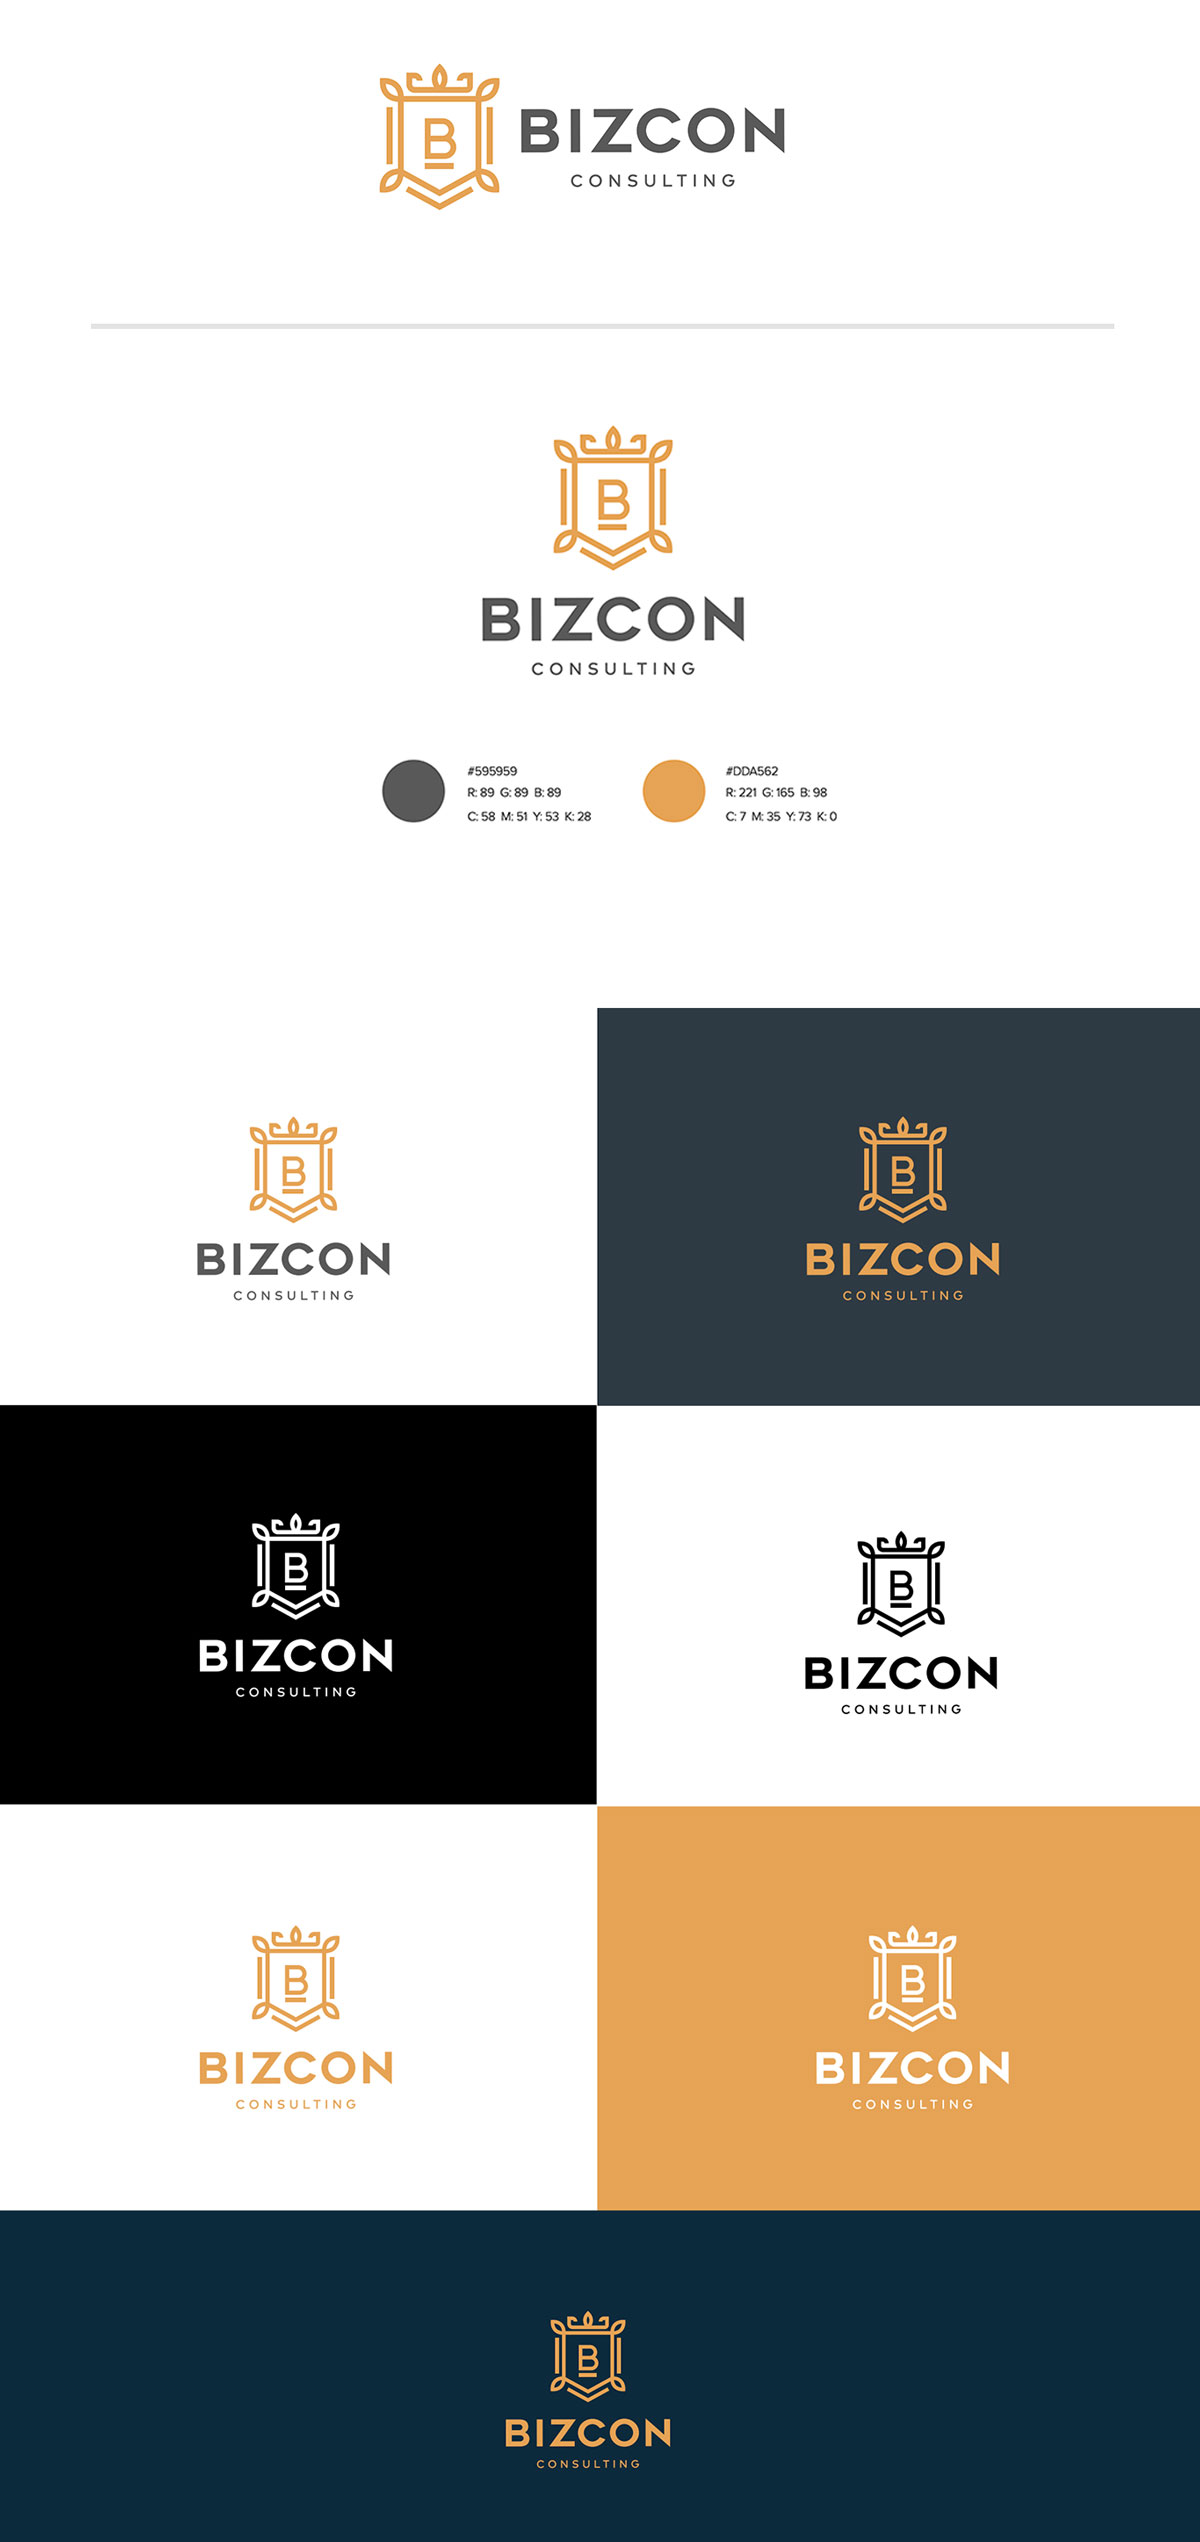 Bizcon Consulting image - 1